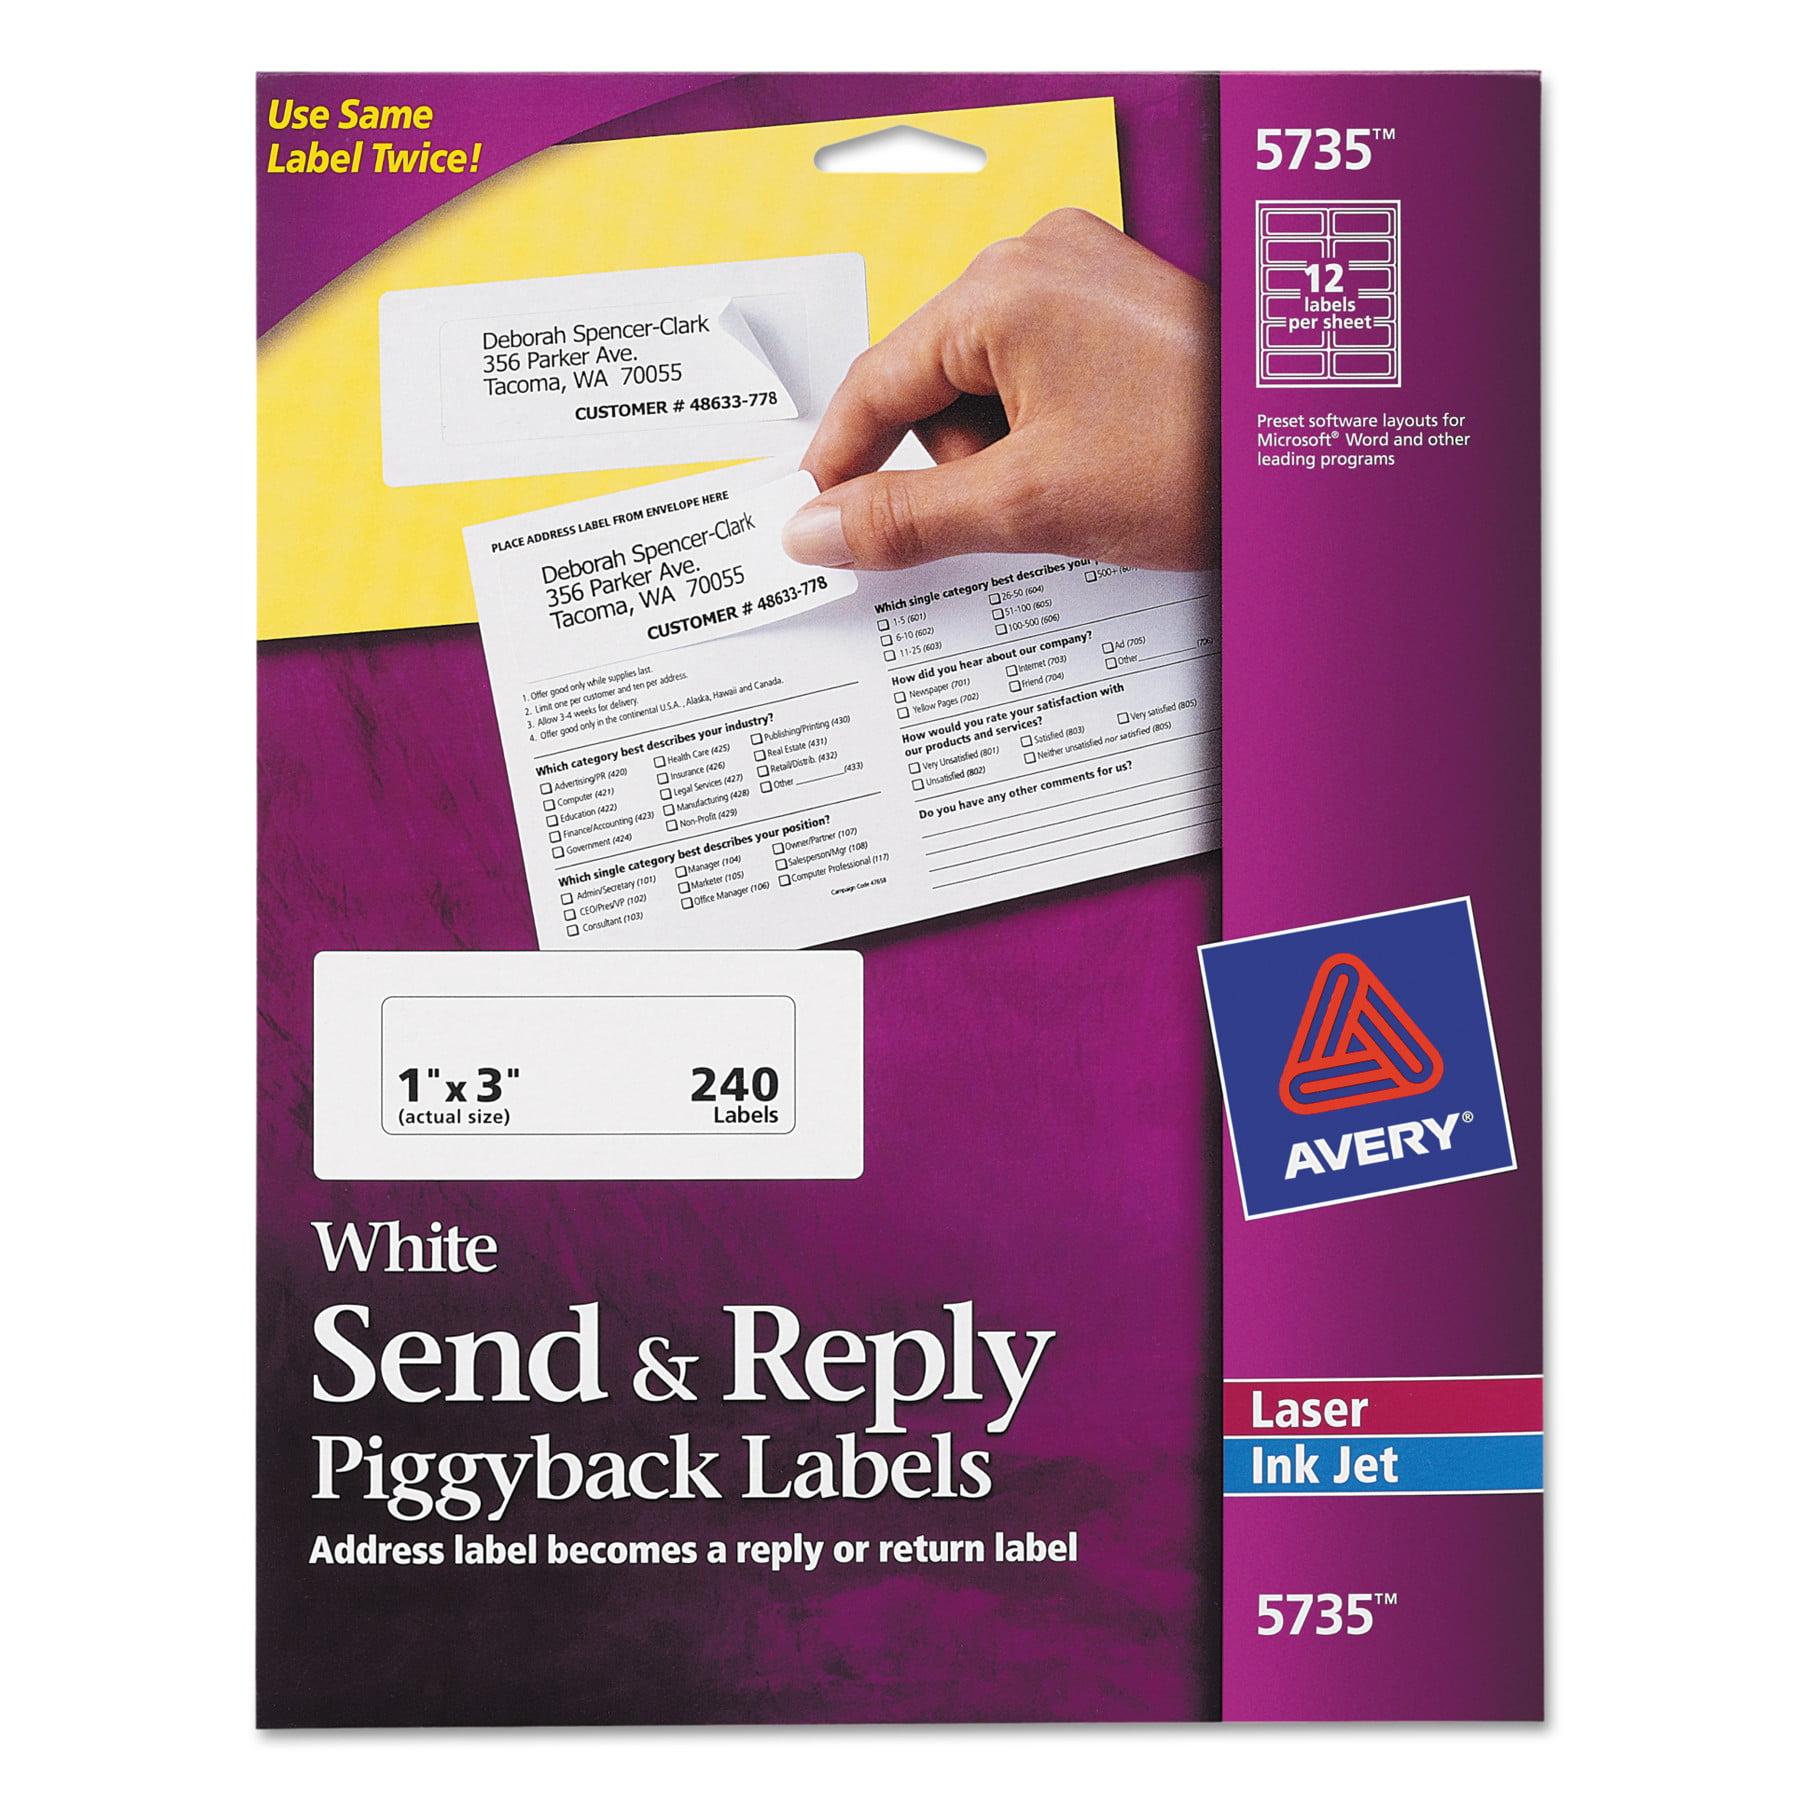 Avery Send & Reply Piggyback Inkjet/Laser Printer Labels, 1 5/8 x 4, White, 240/Pack